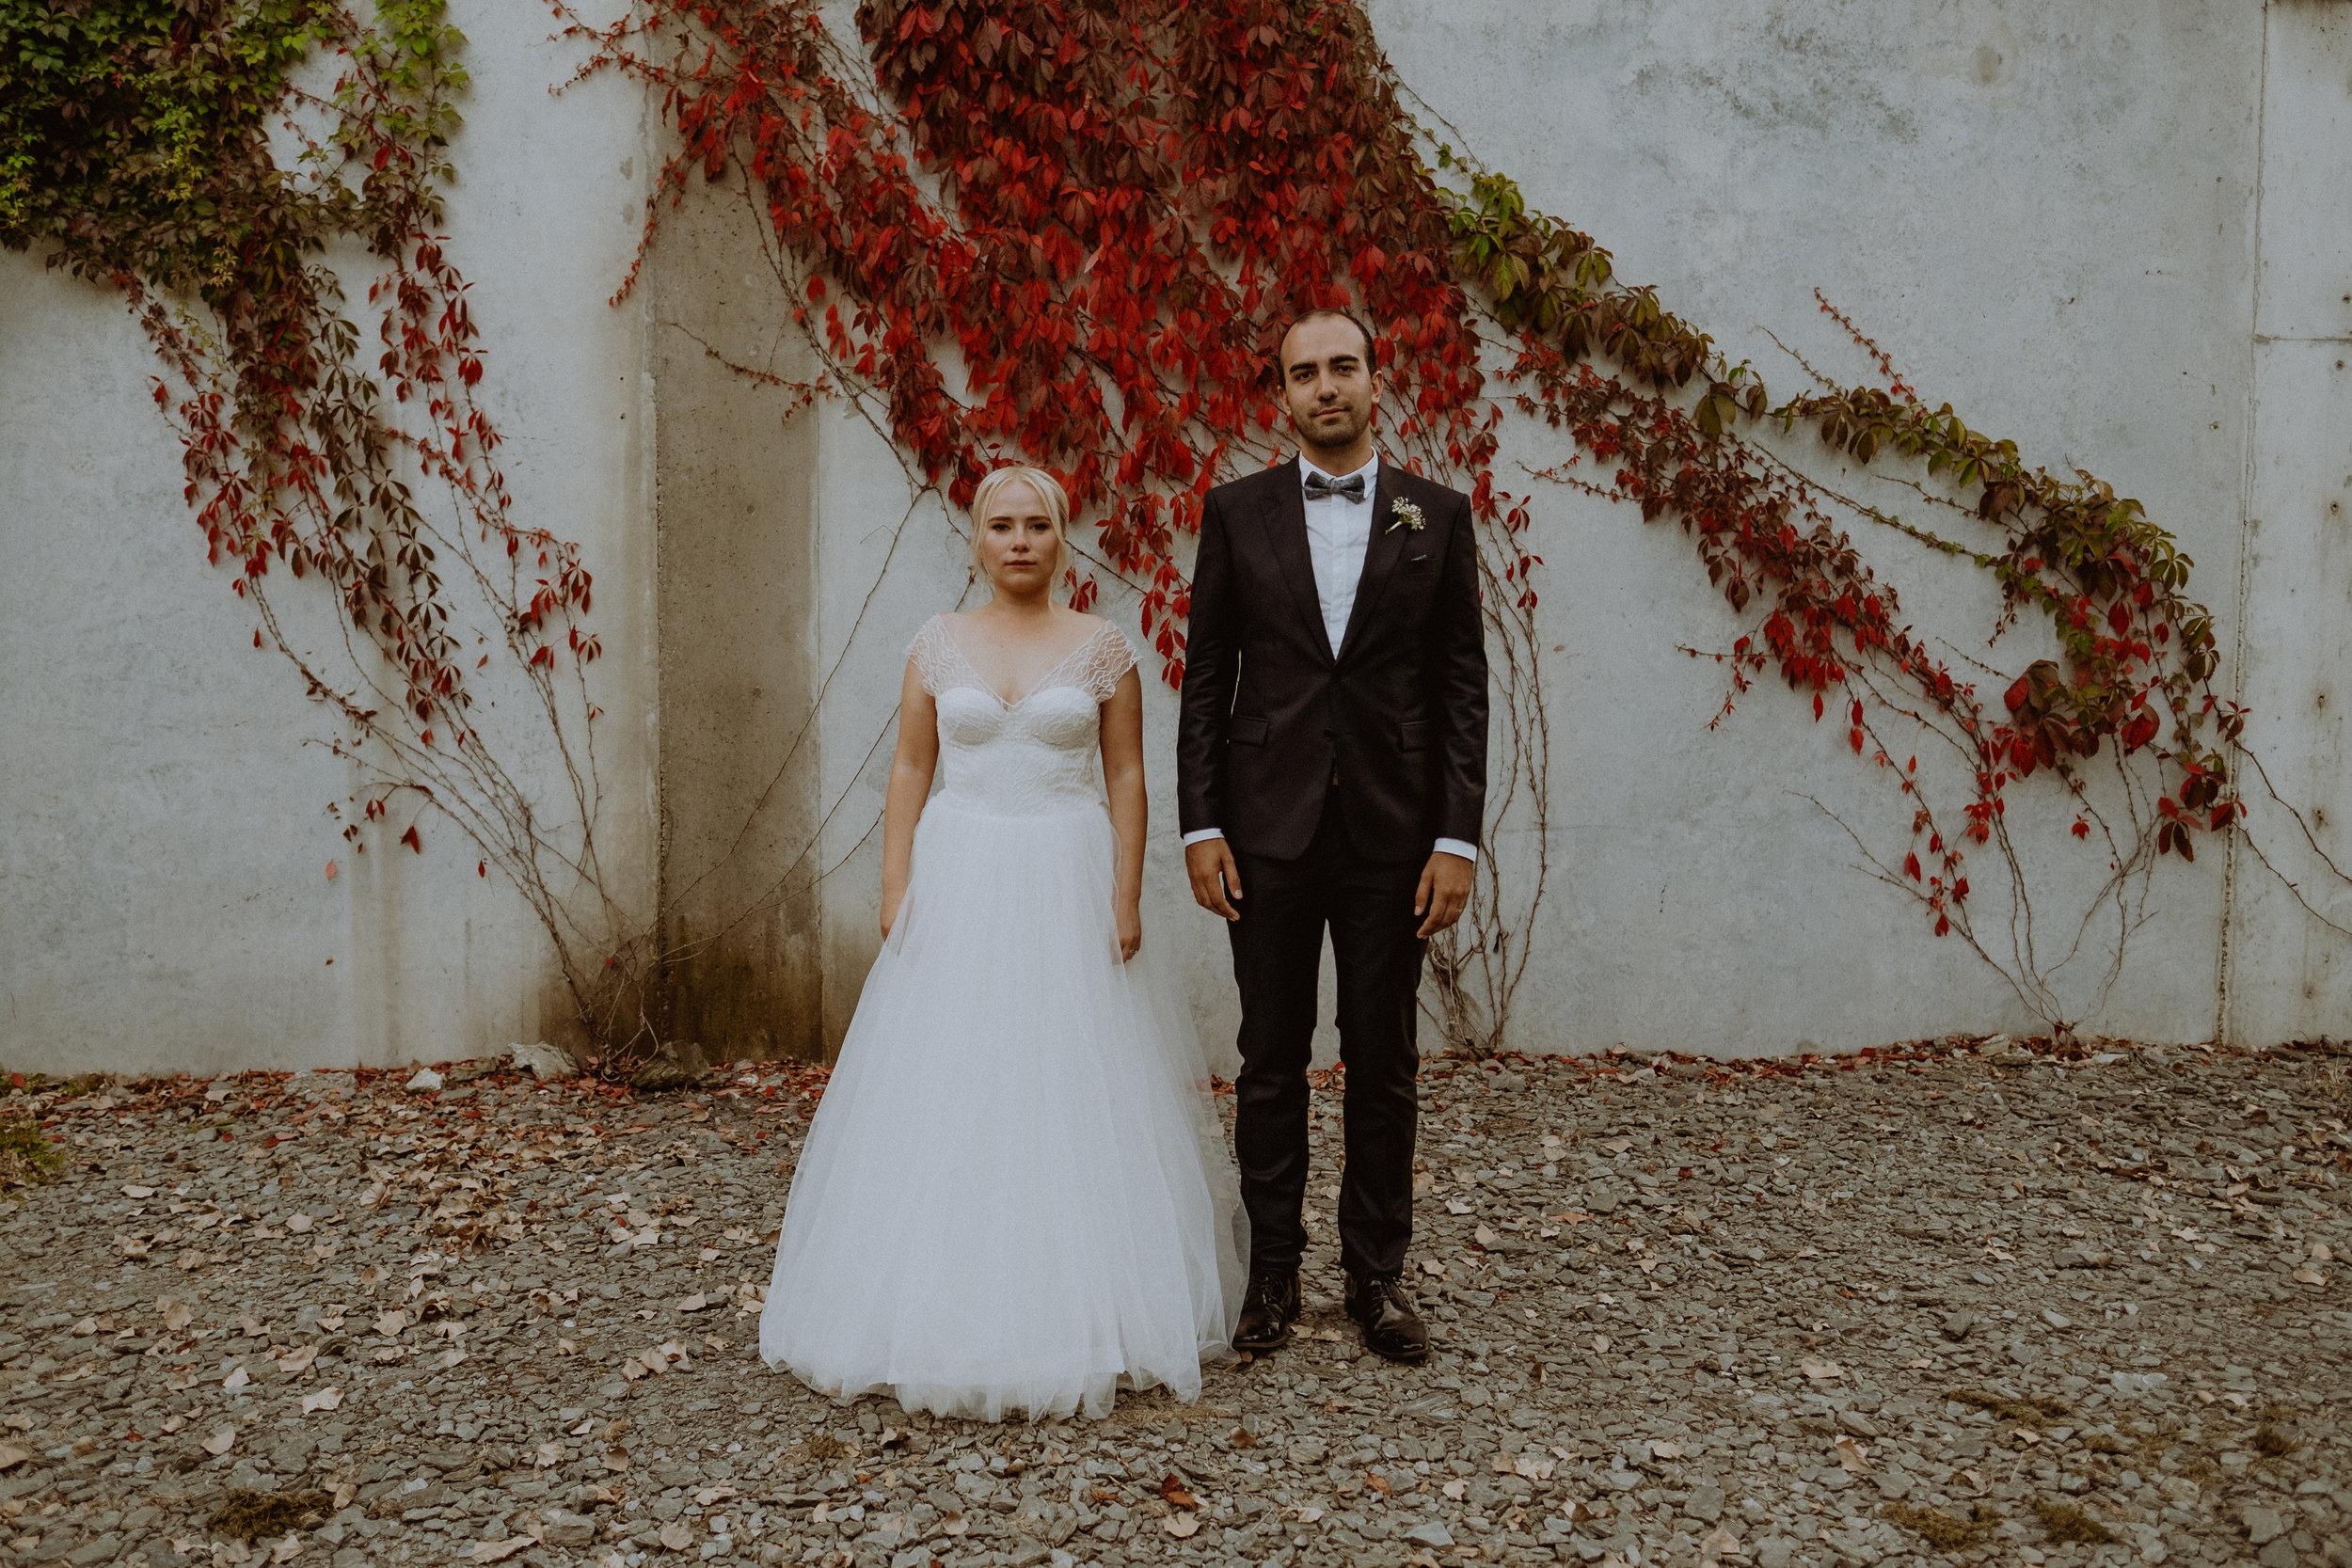 perrigrine wines wedding kseniya and travis chellise michael photography726.JPG